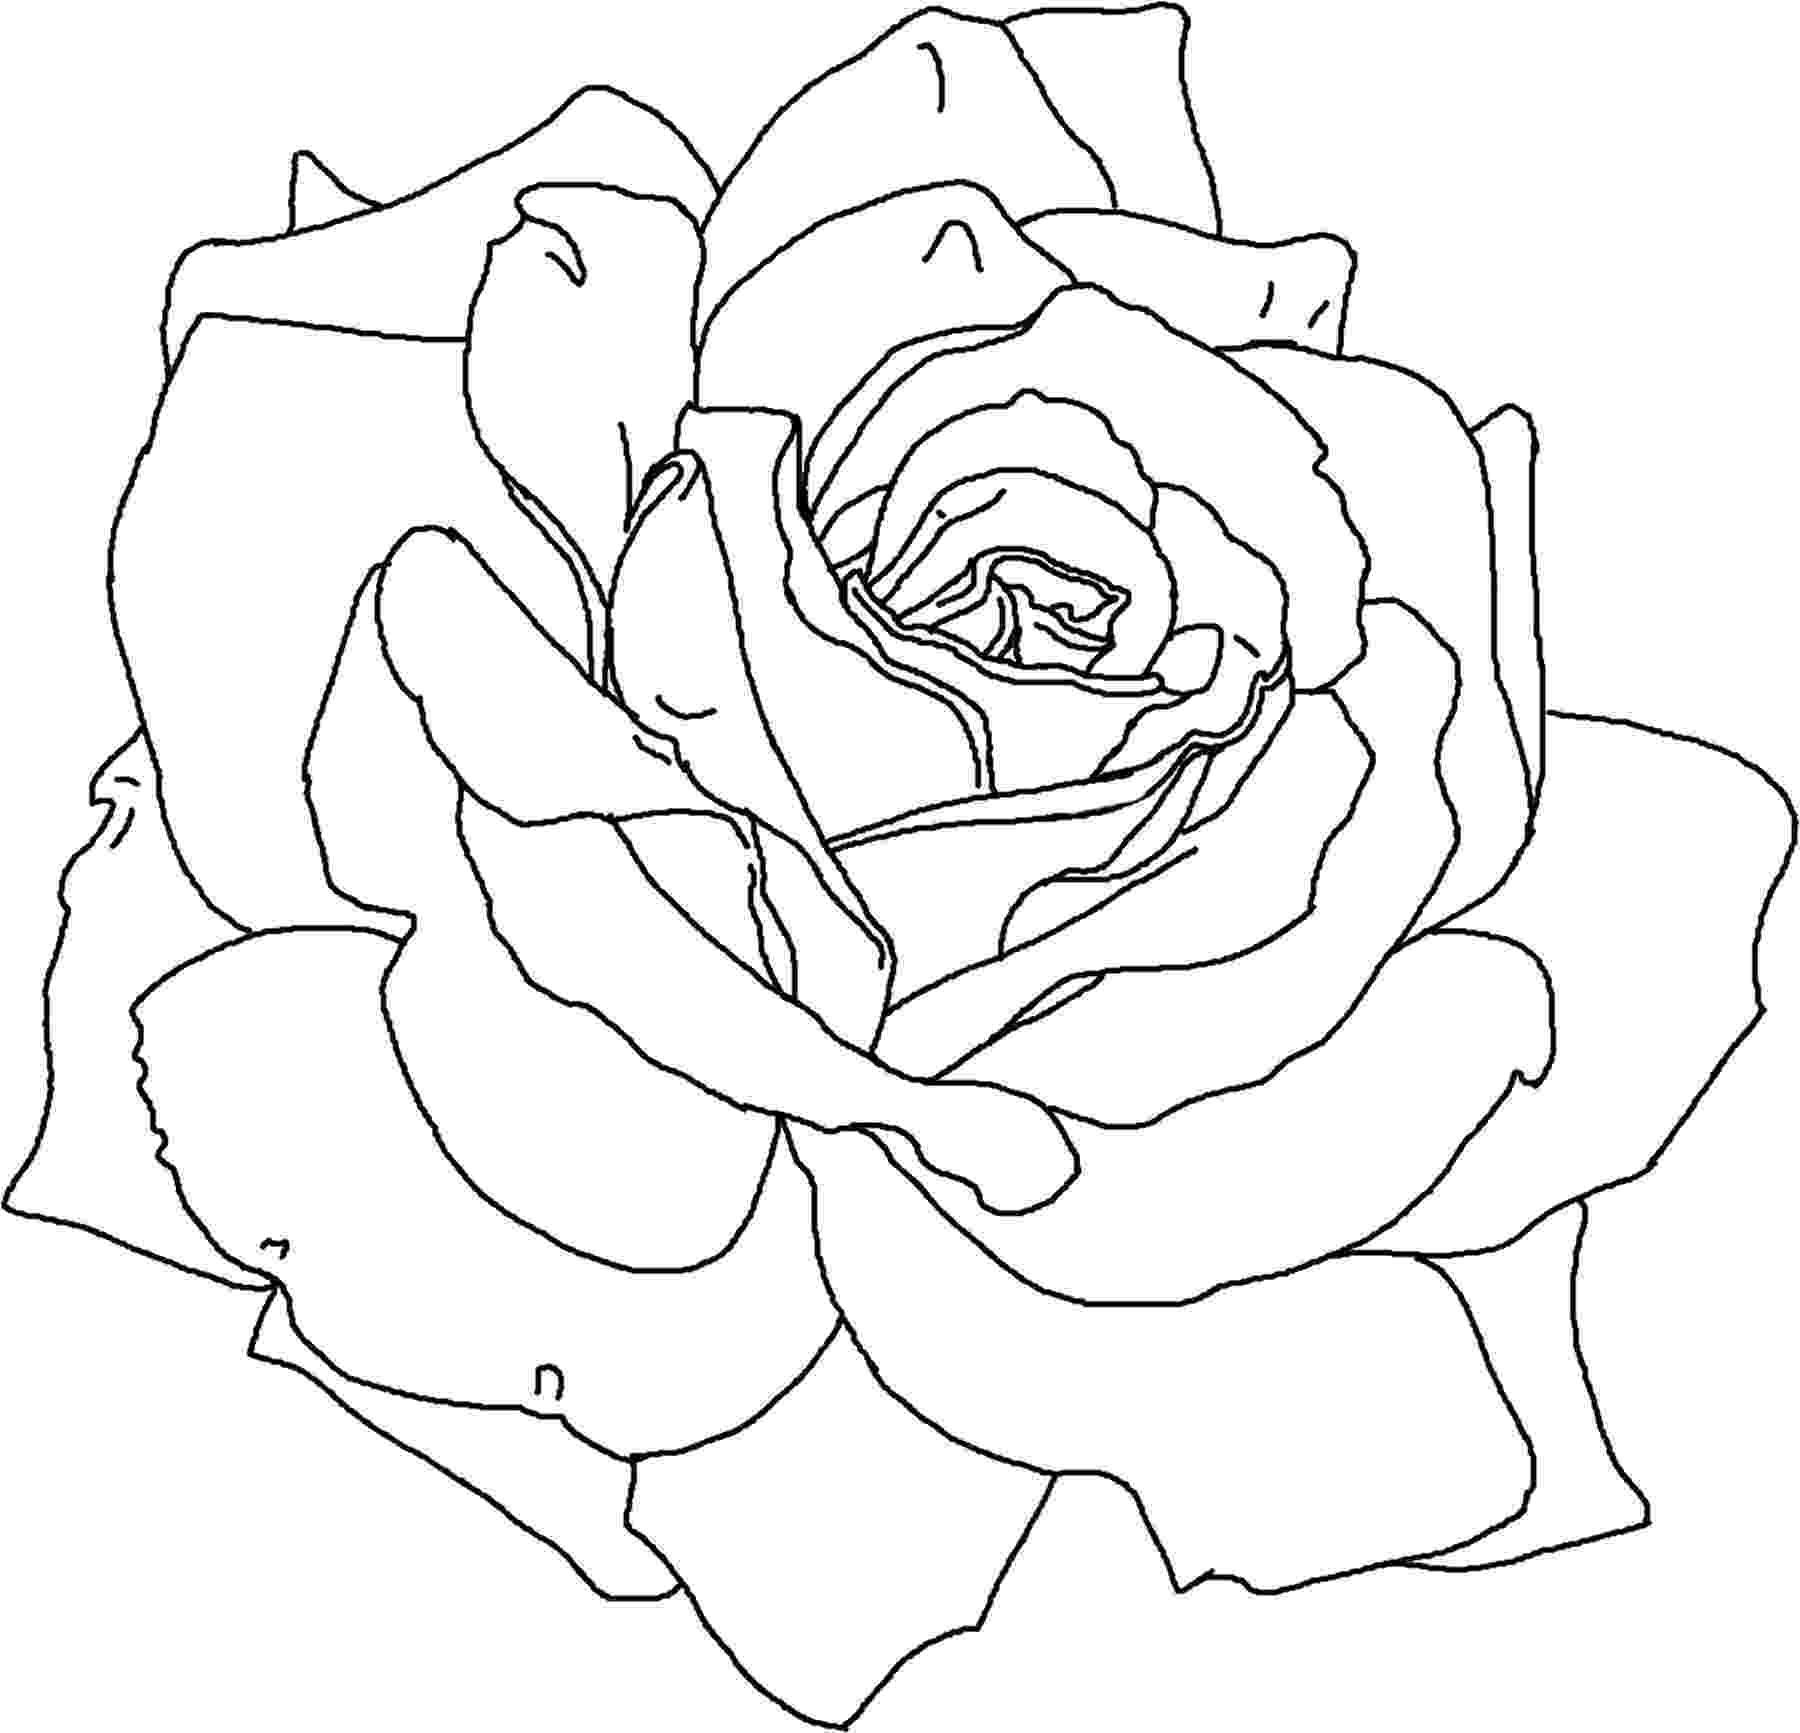 flower printables free printable flower coloring pages for kids best flower printables 1 4